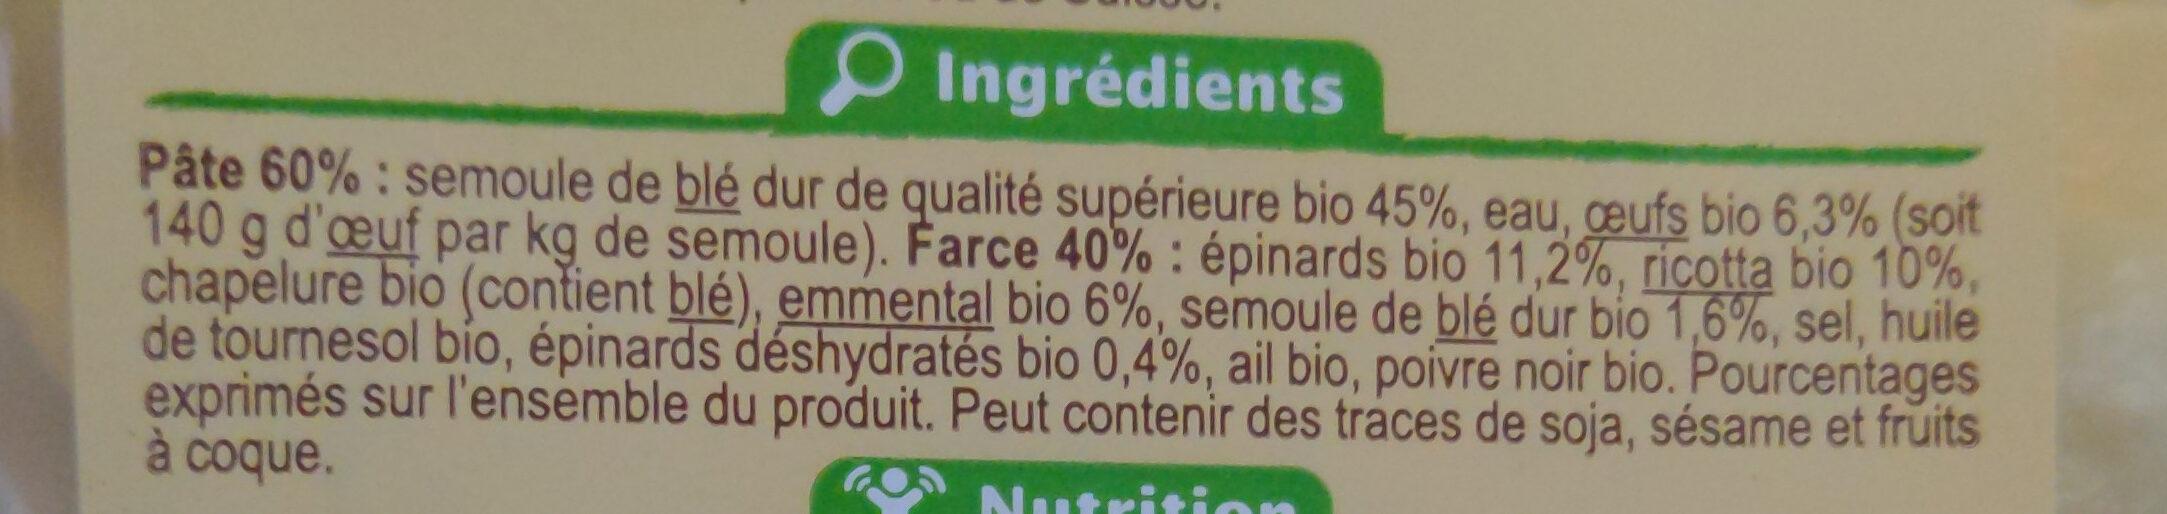 Ravioli Frais Bio épinard Et Ricotta, 250g - Inhaltsstoffe - fr